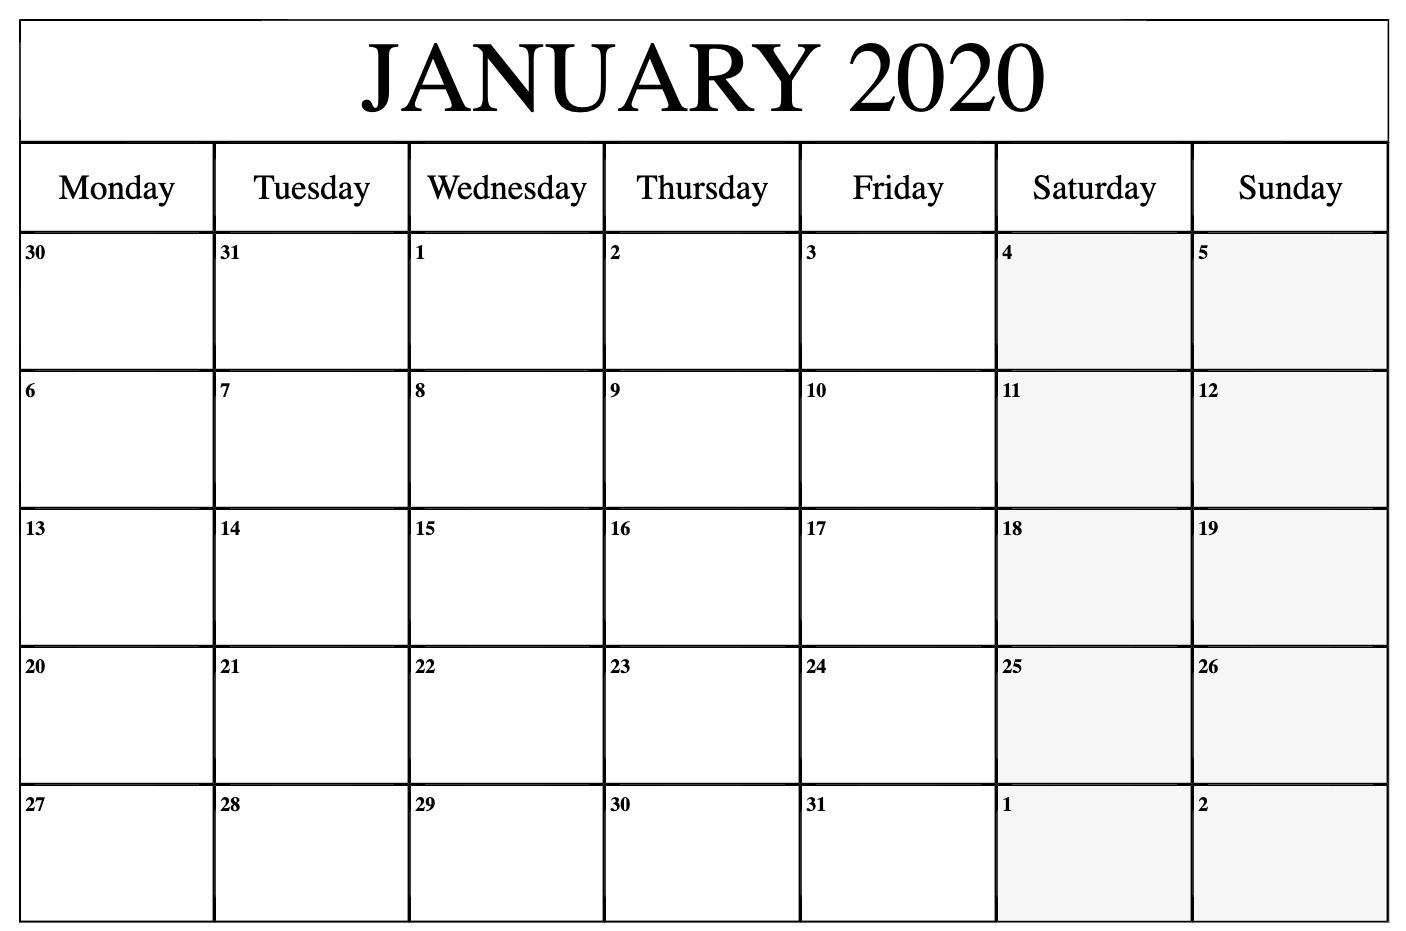 January 2020 Calendar Printable Template In Pdf Word Excel